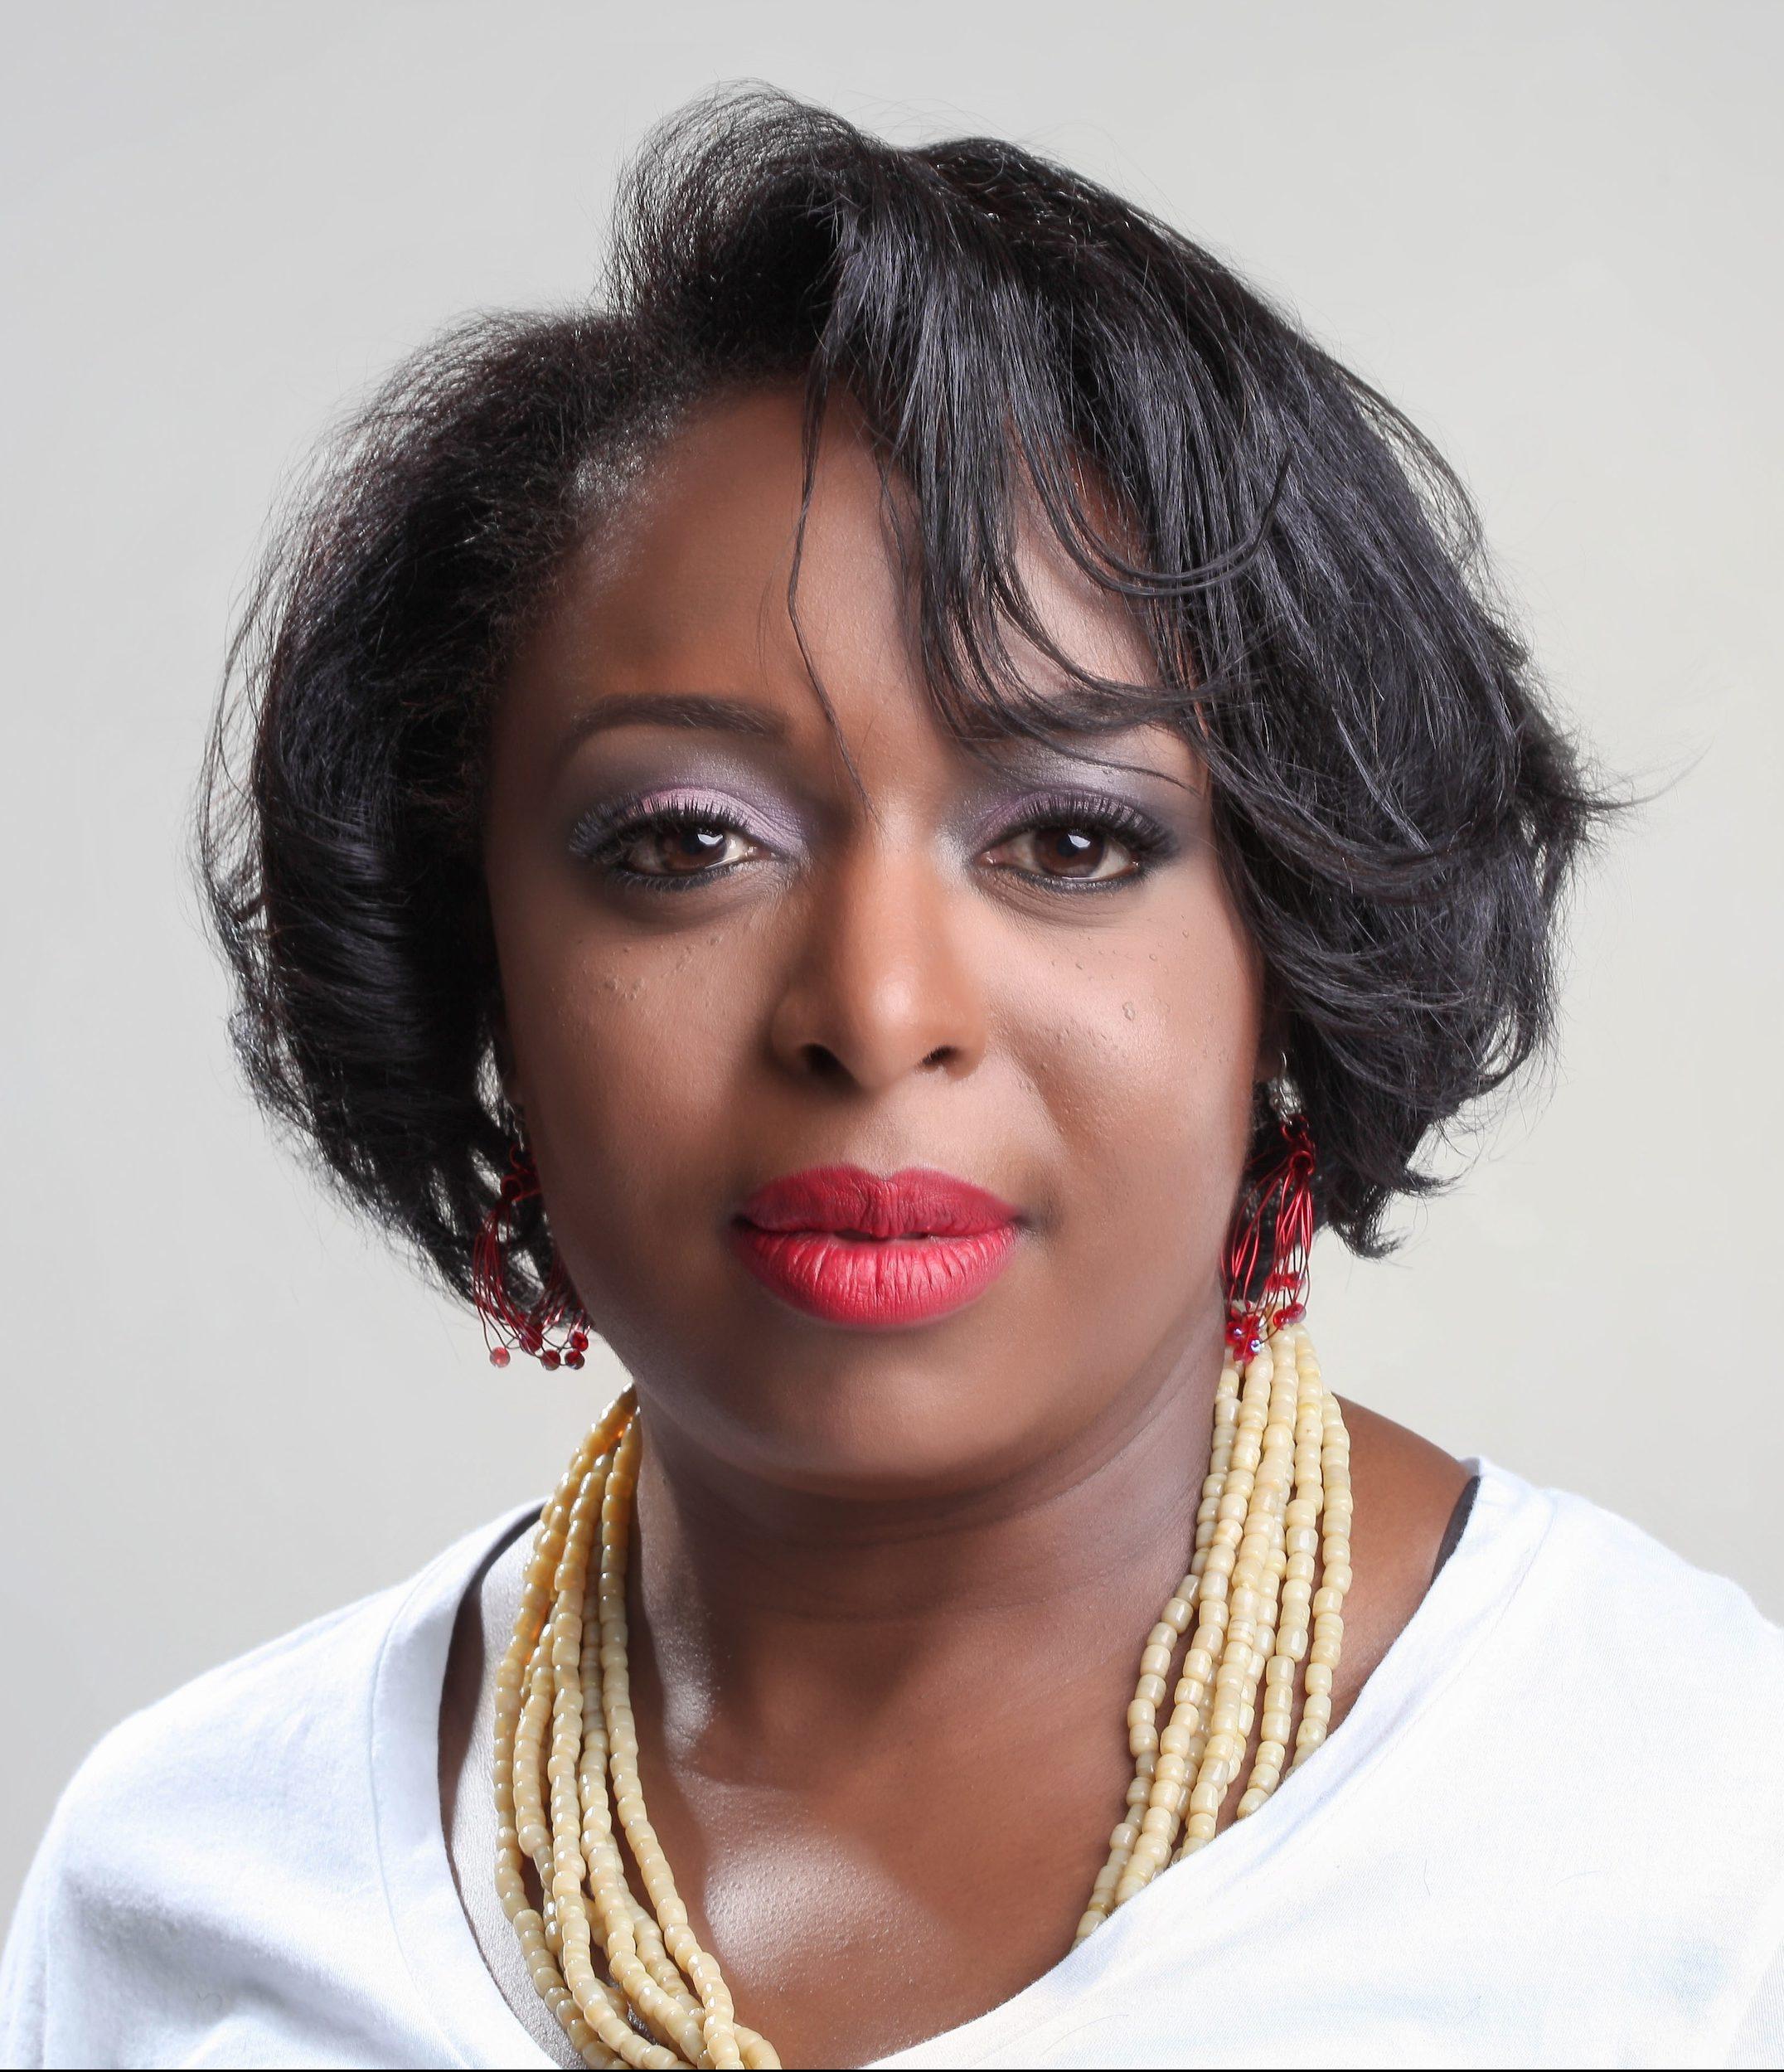 Kimberly Bryant Keynote Speakers Bureau and Speaking Fee